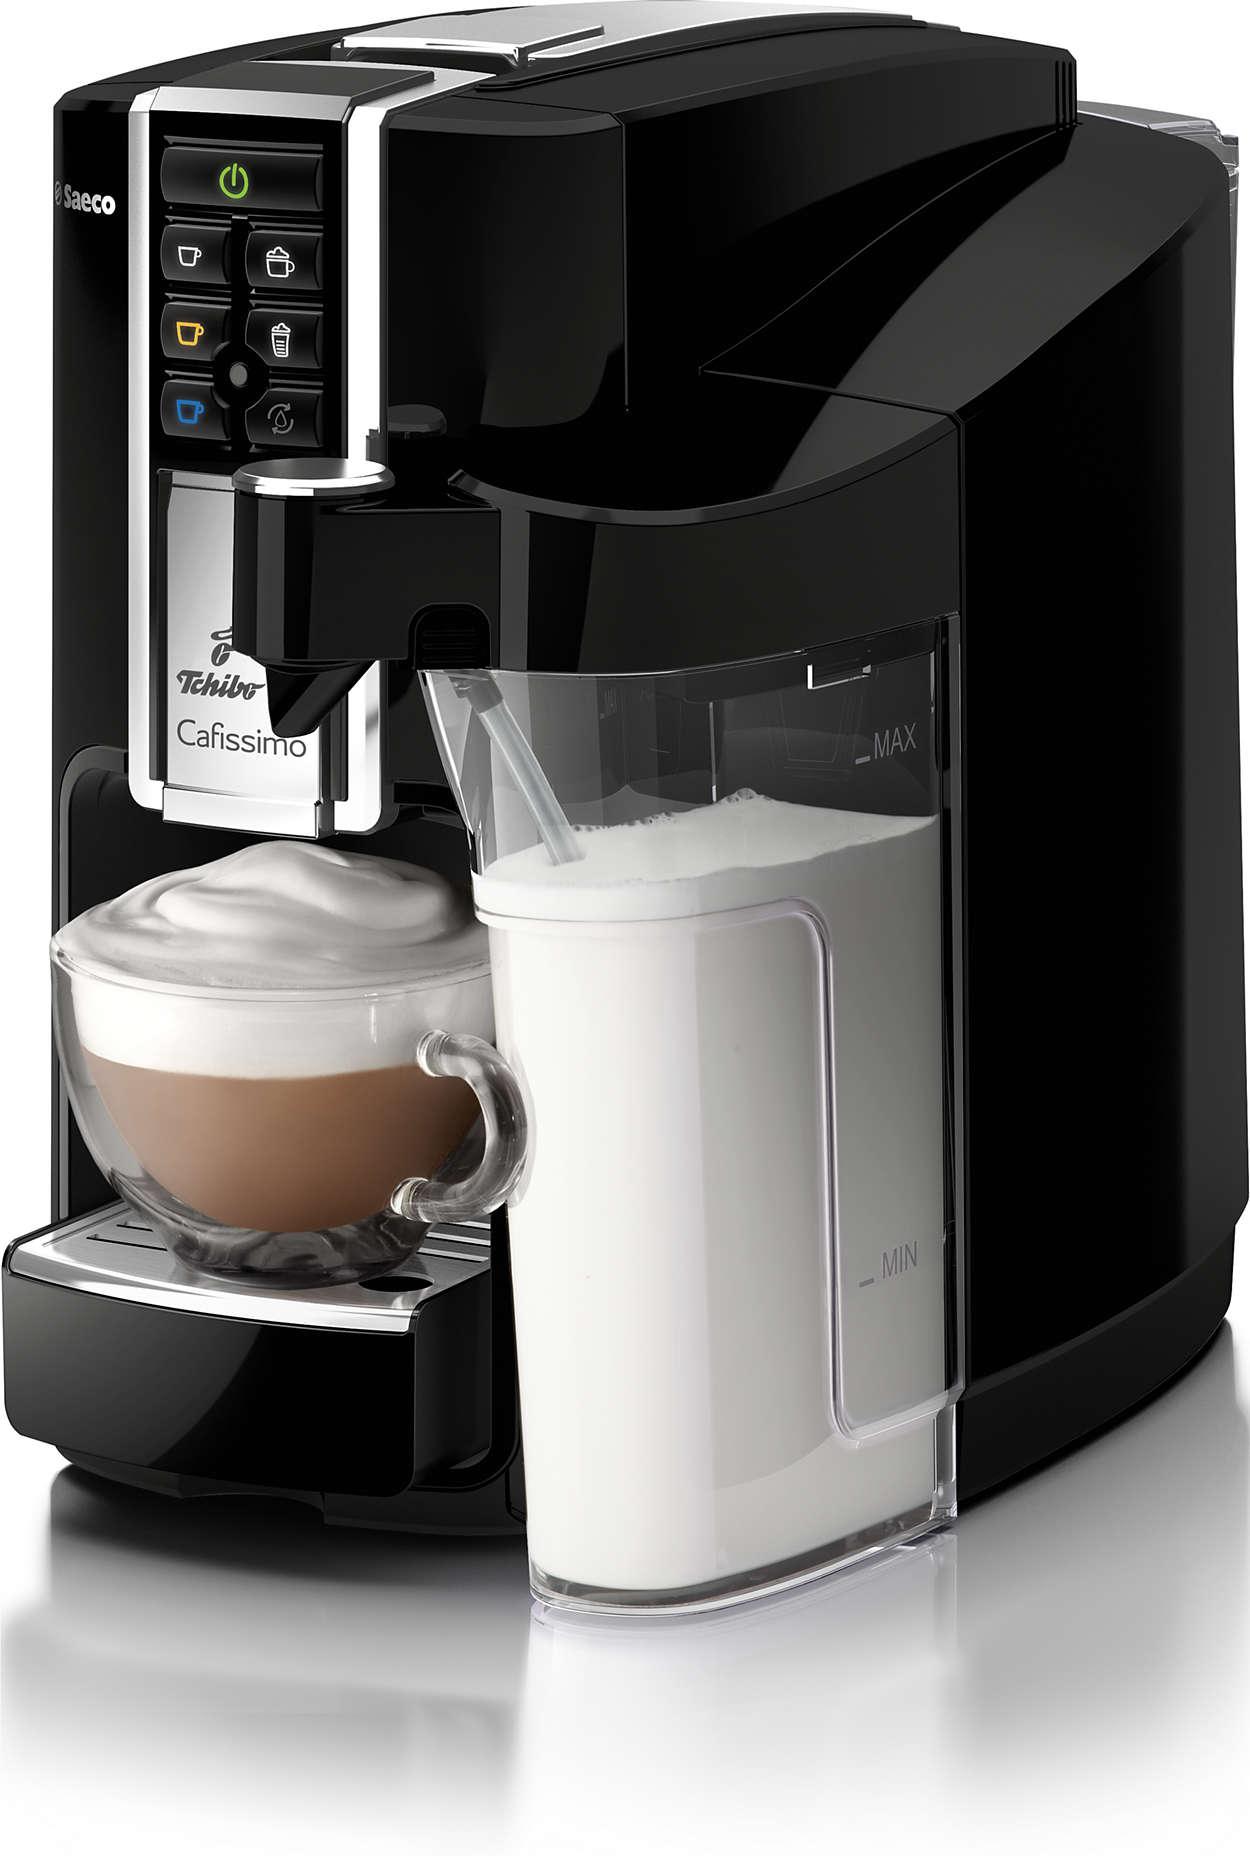 latte machine caf capsules hd8603 31 cafissimo. Black Bedroom Furniture Sets. Home Design Ideas